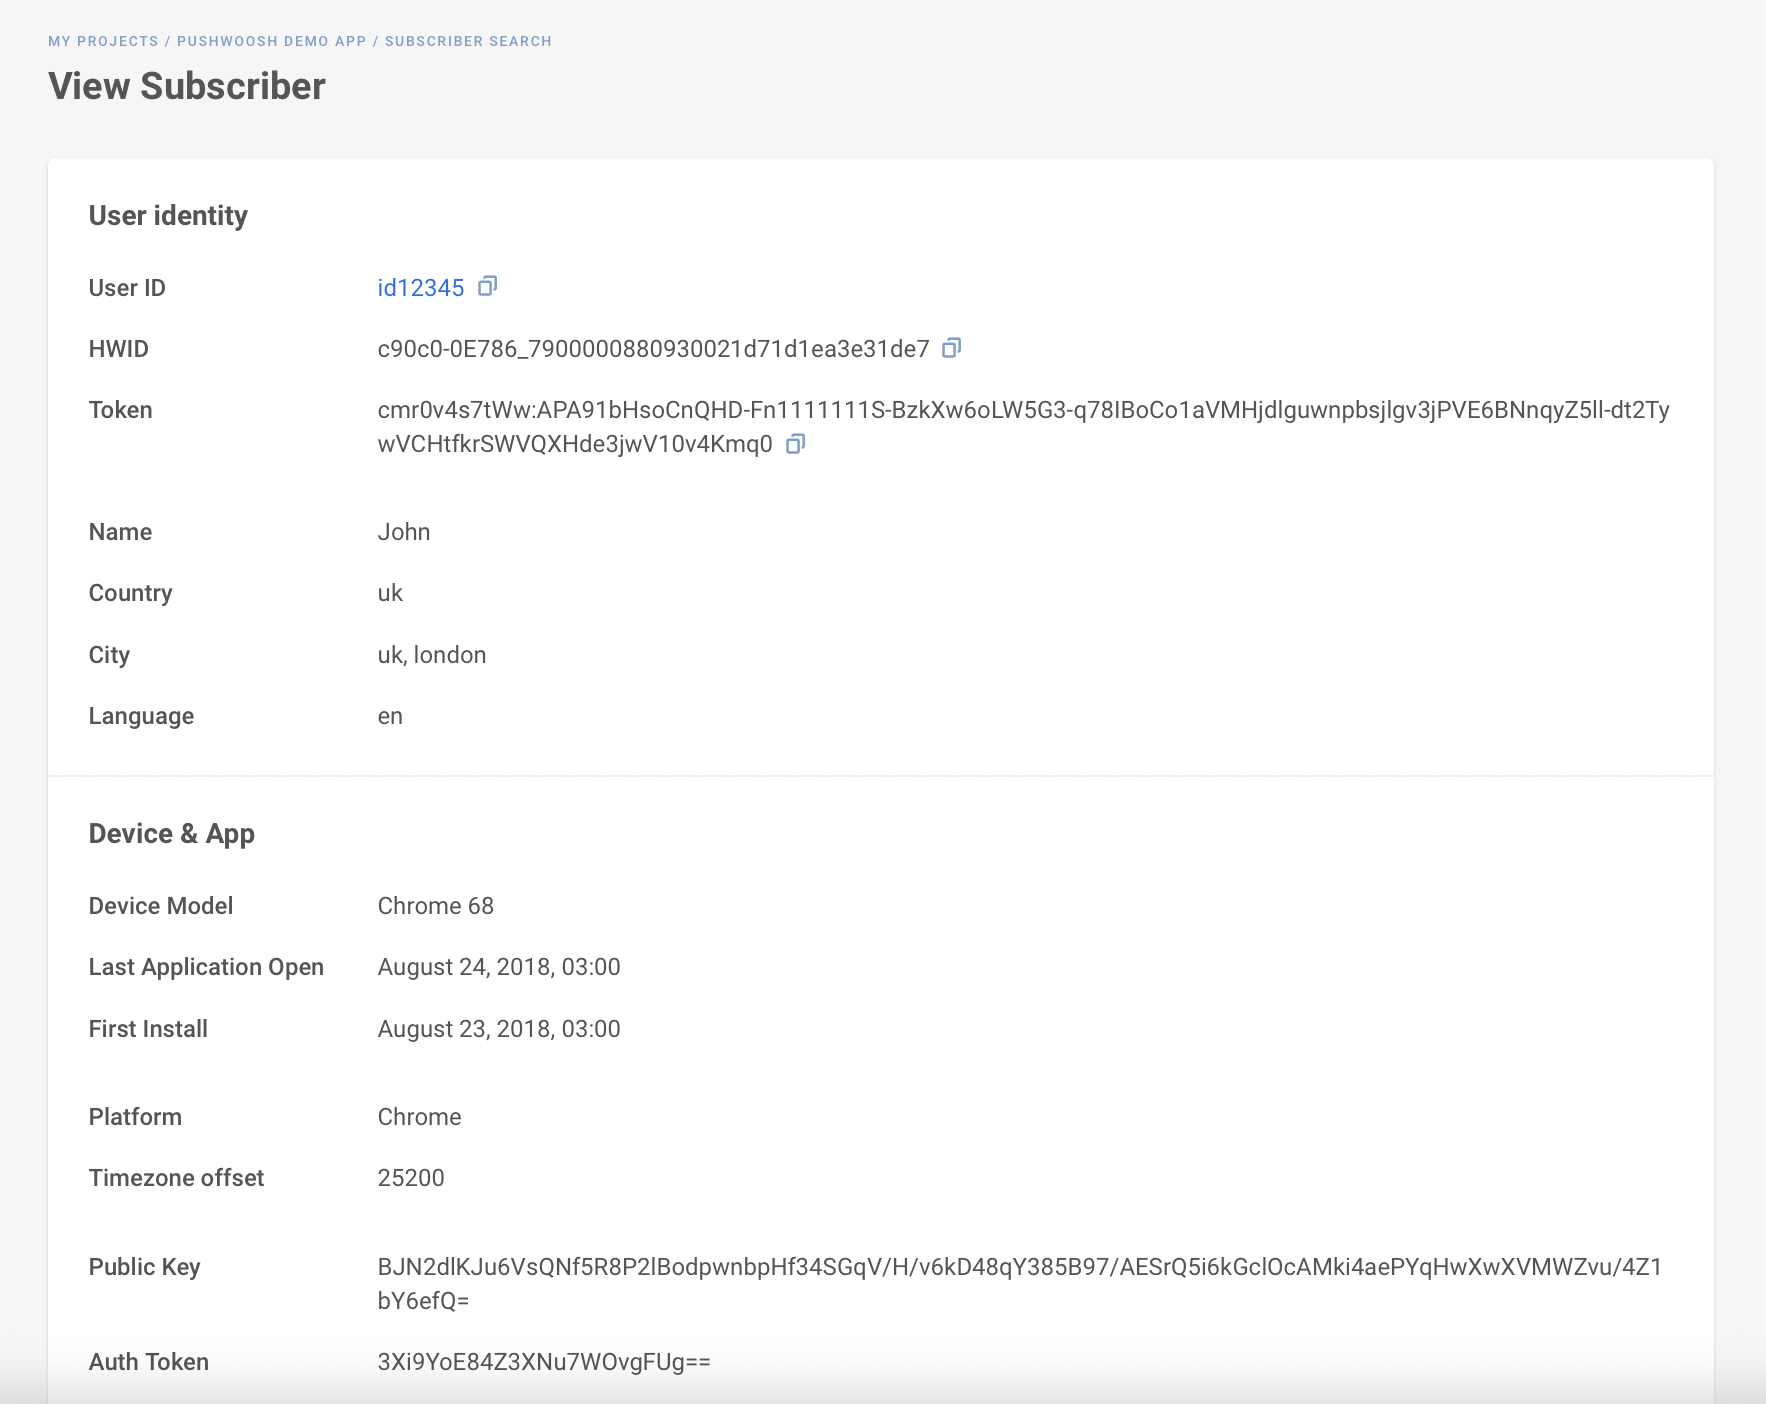 User Explorer - Pushwoosh Product Update